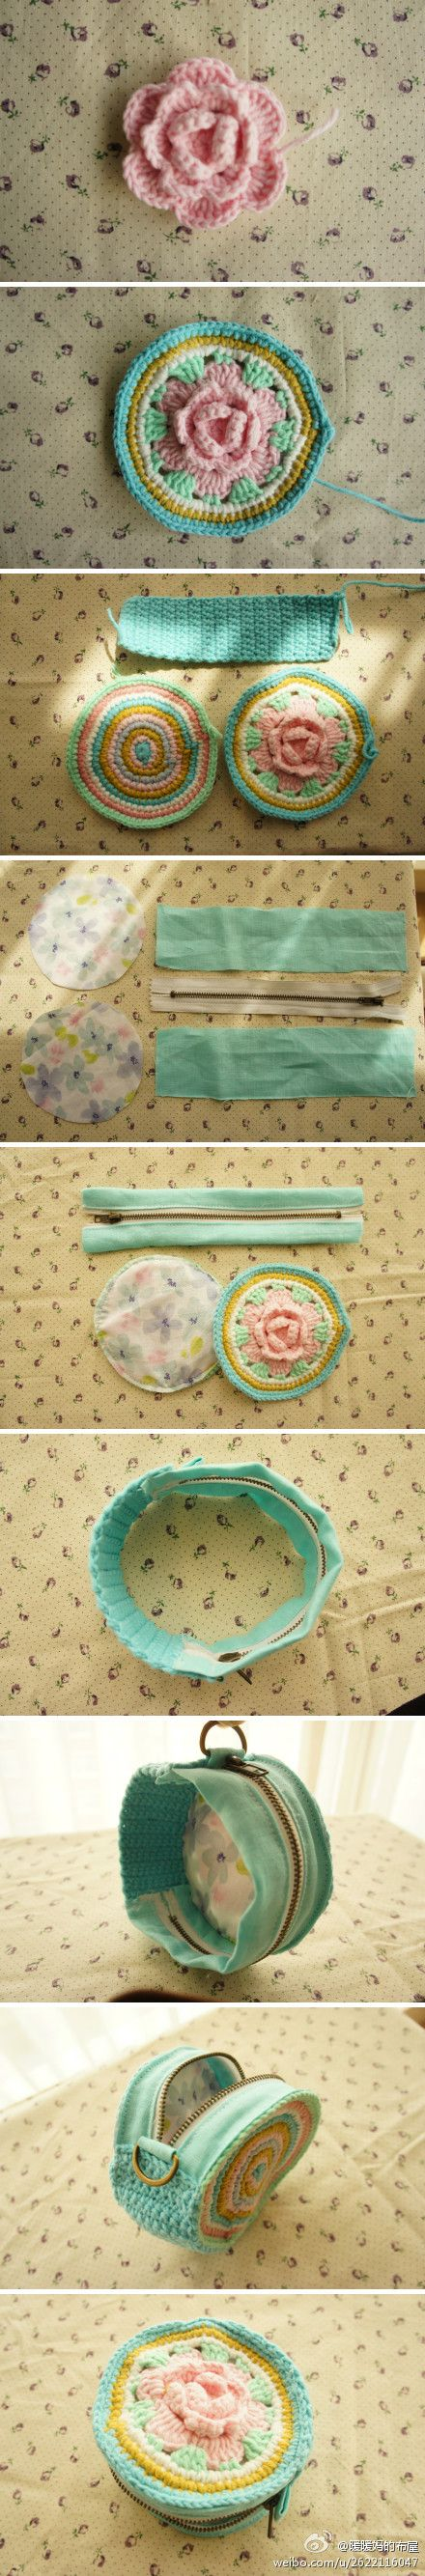 diy fabric & crochet zipper coin purse. Not in English, but several good photos. #crochet